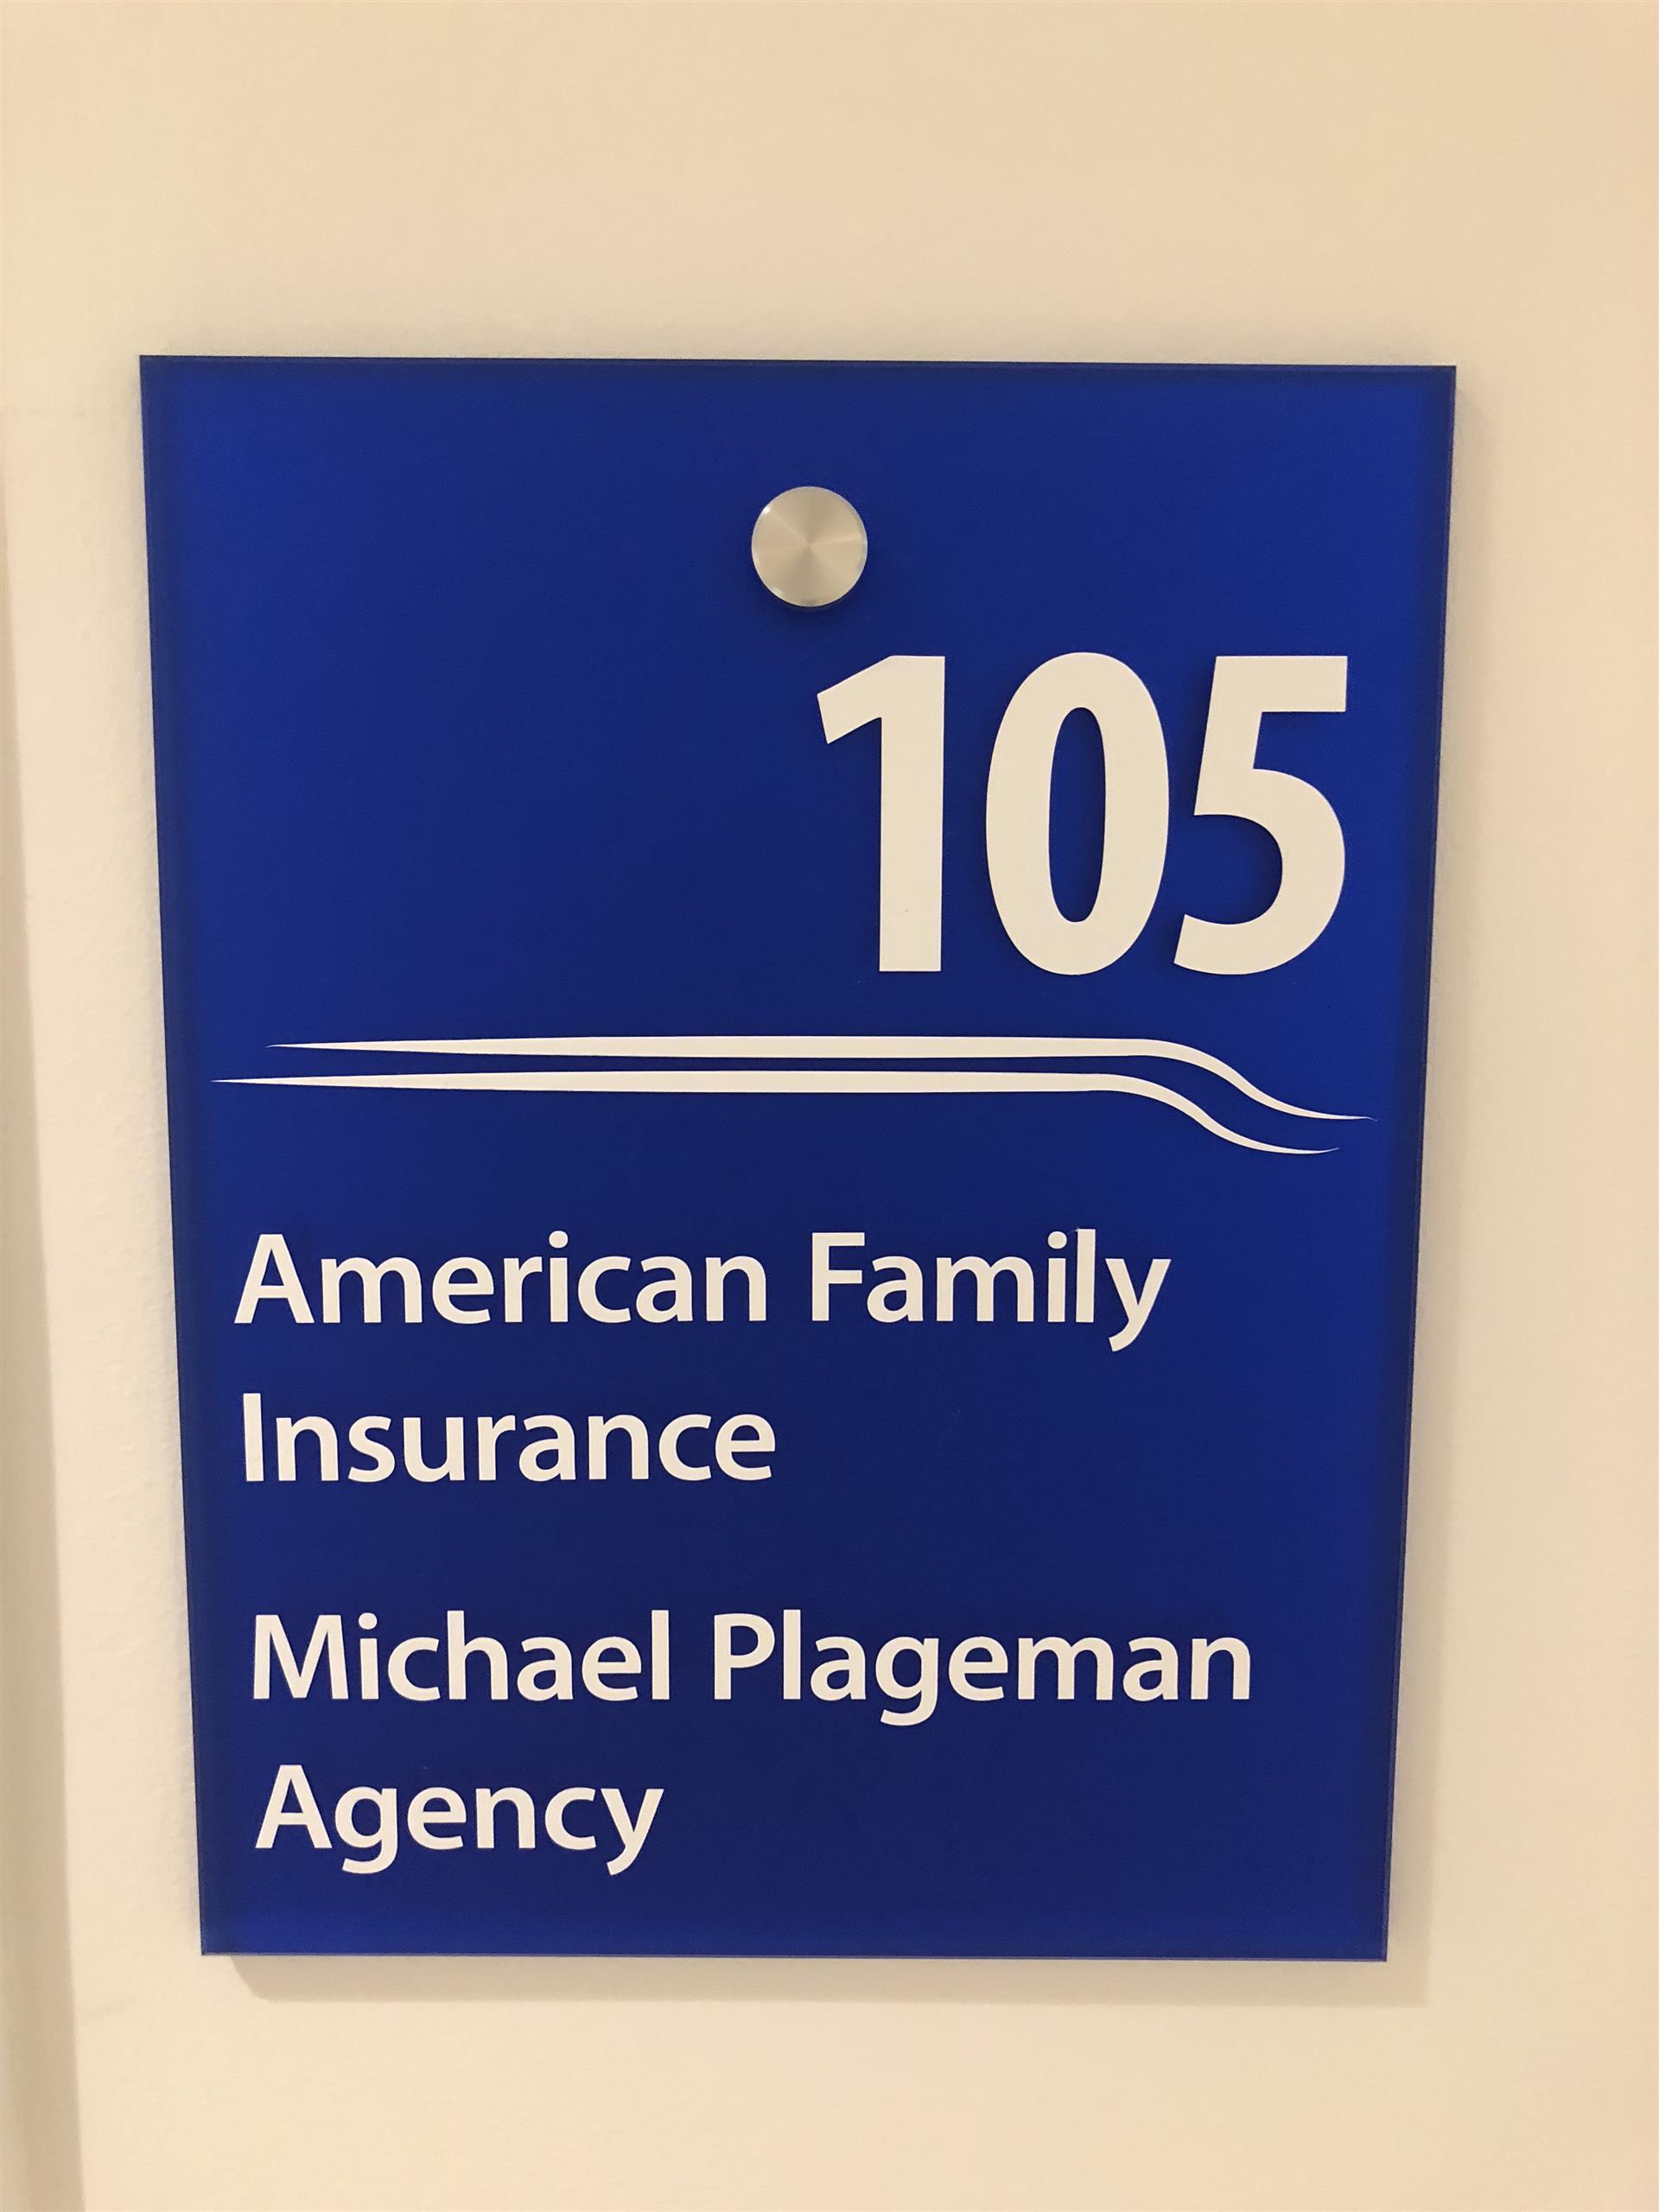 105 Directory ADA Sign